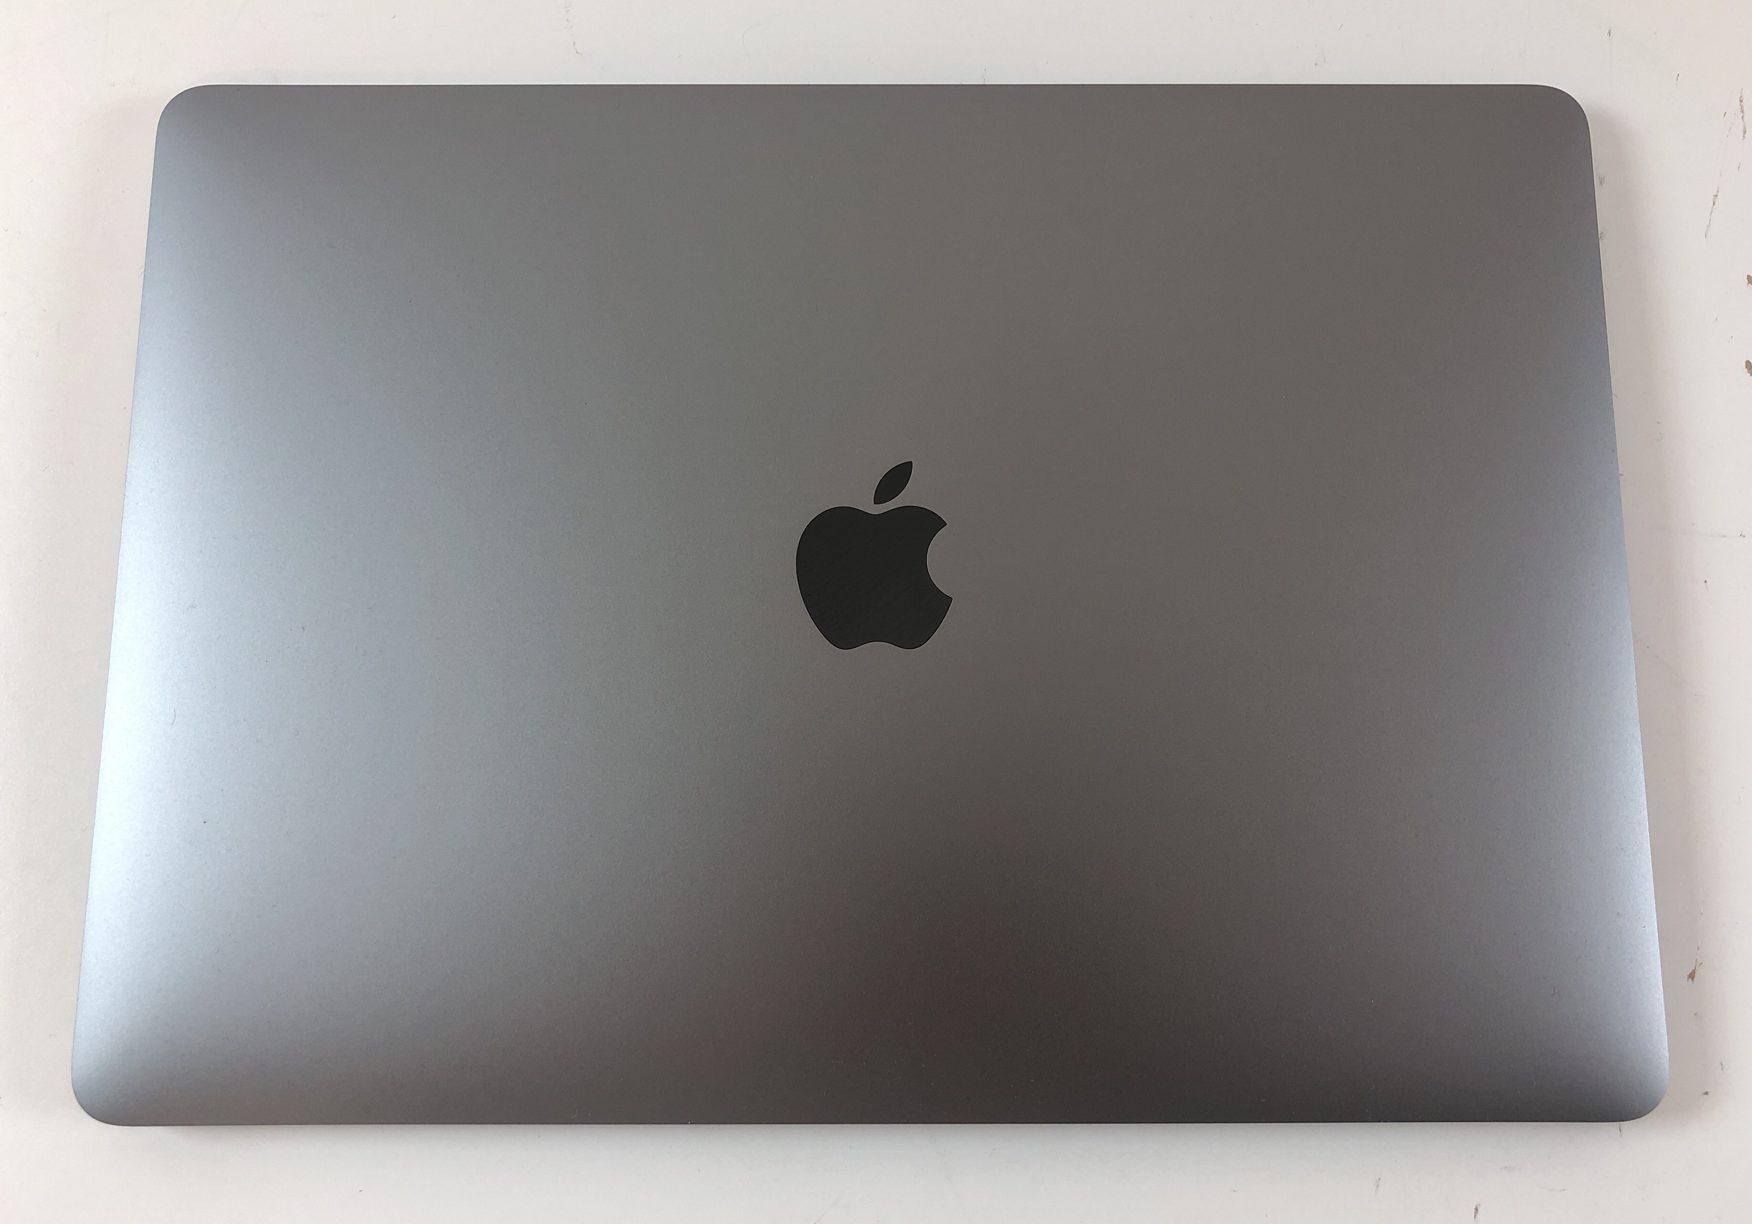 "MacBook Pro 13"" 4TBT Late 2016 (Intel Core i5 2.9 GHz 16 GB RAM 512 GB SSD), Space Gray, Intel Core i5 2.9 GHz, 16 GB RAM, 512 GB SSD, Afbeelding 2"